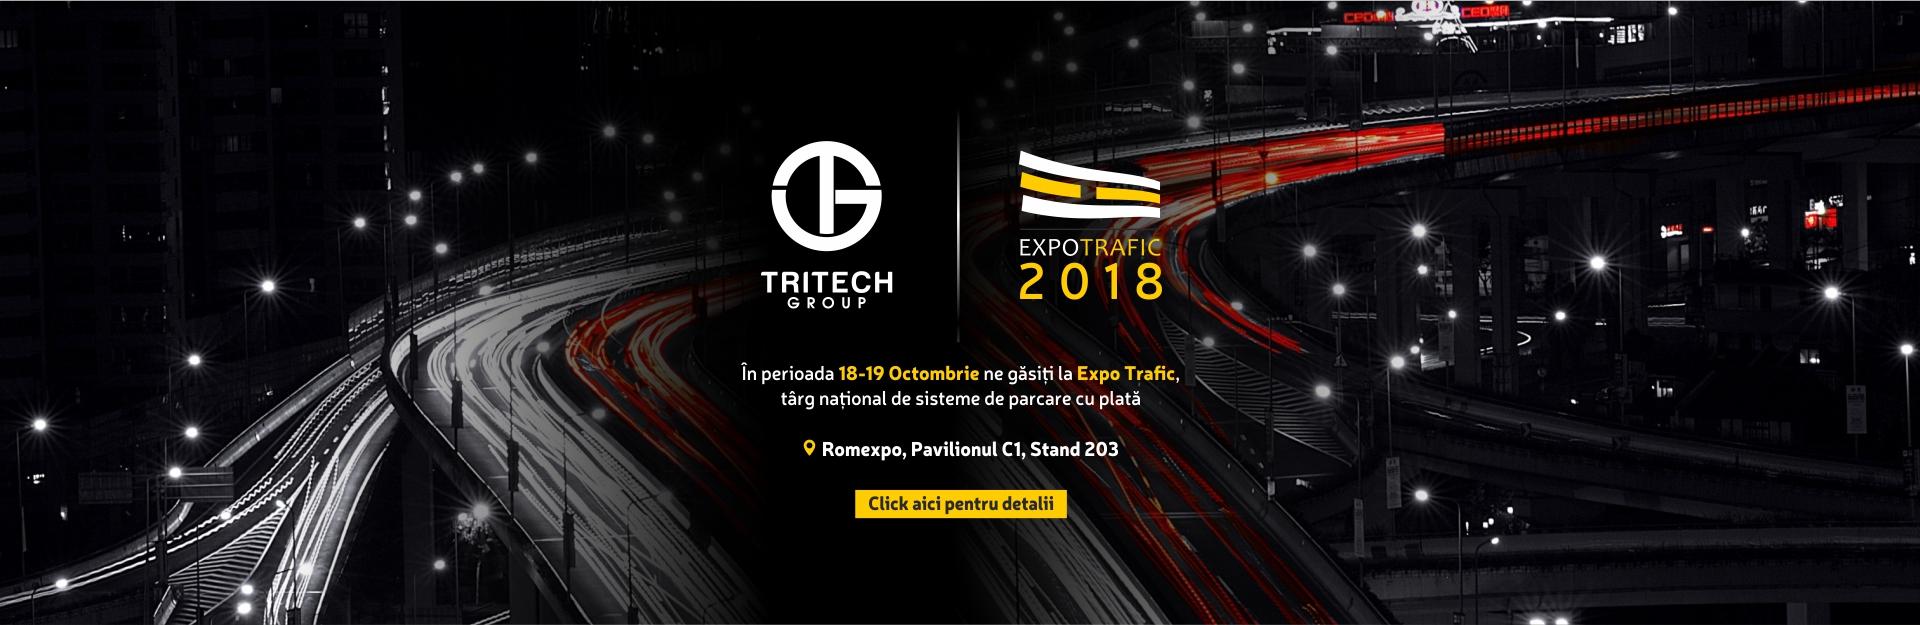 Expotrafic 2018 Tritech Group